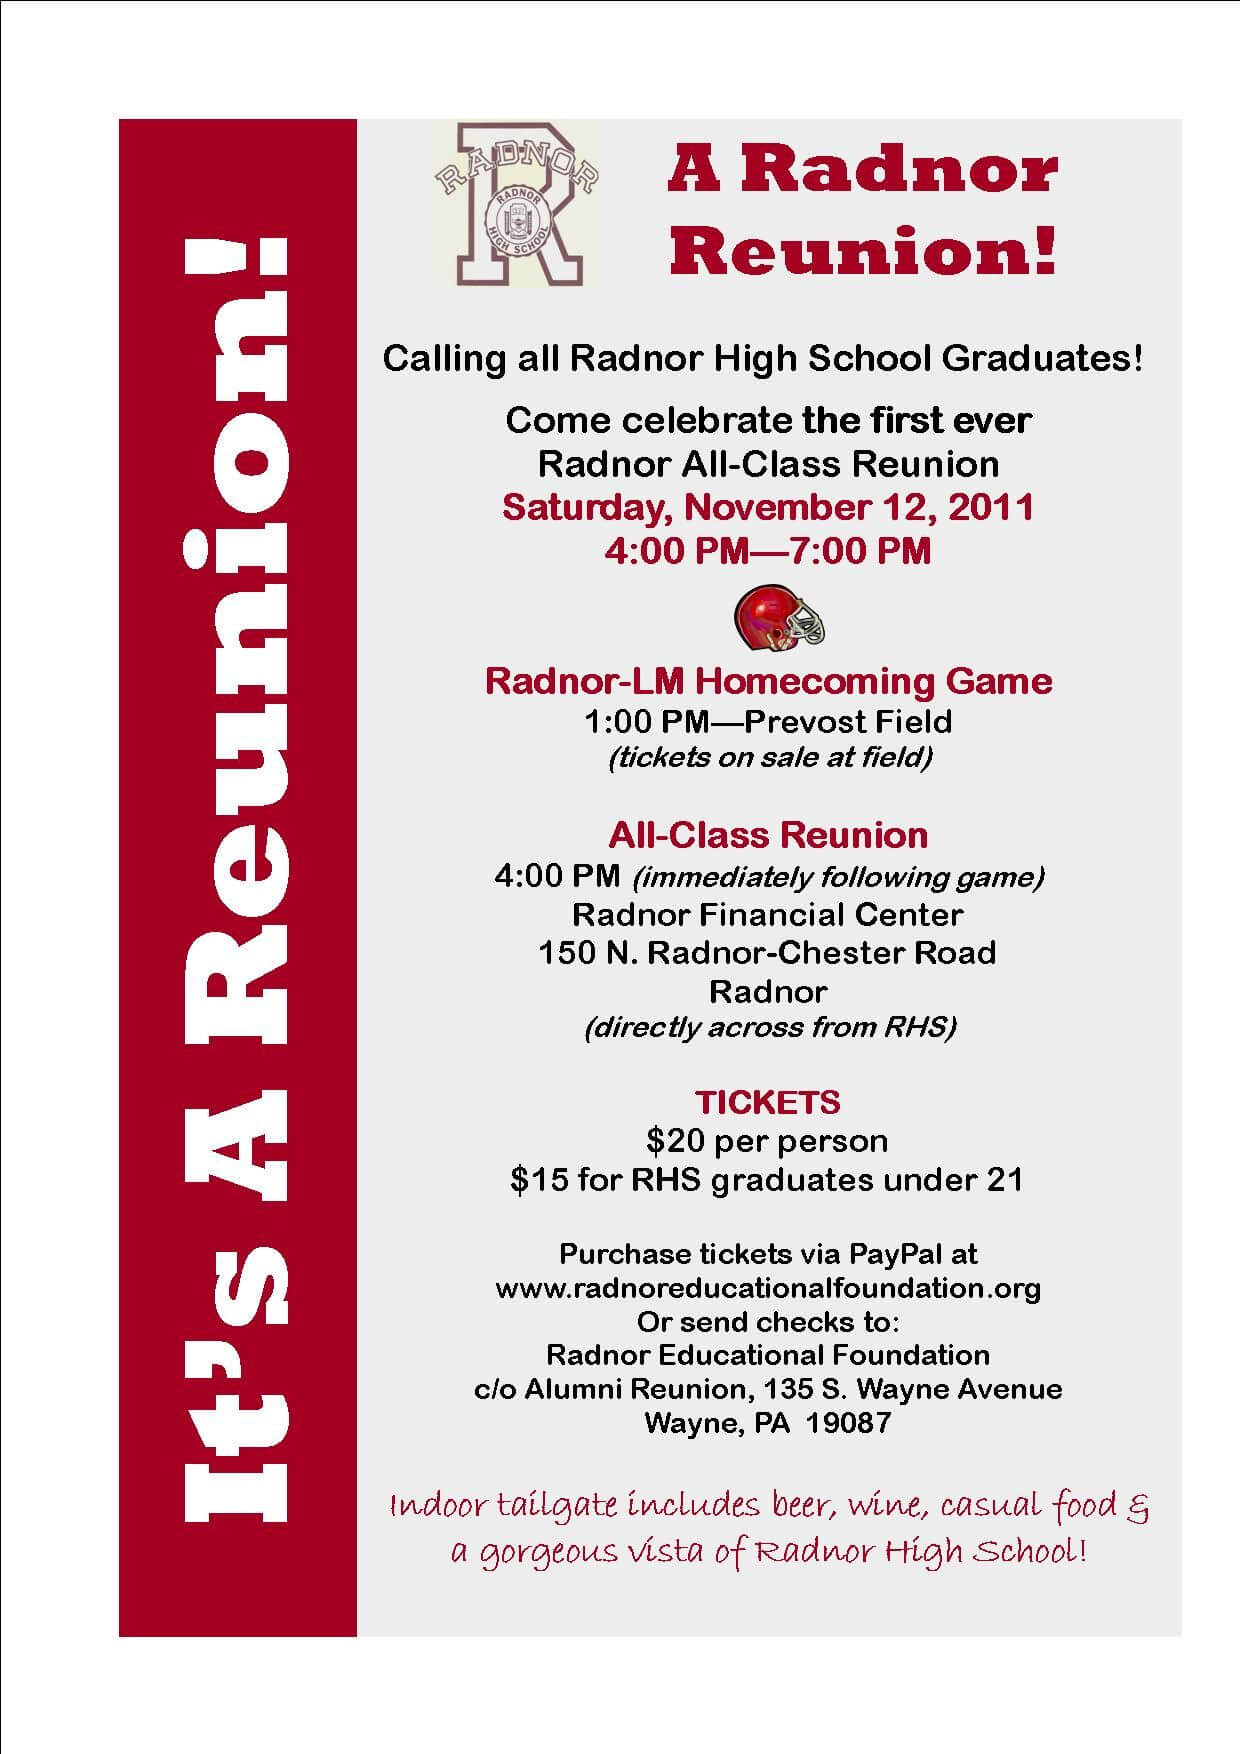 Class Reunion Invitations | Invitations | Class Reunion Inside Reunion Invitation Card Templates